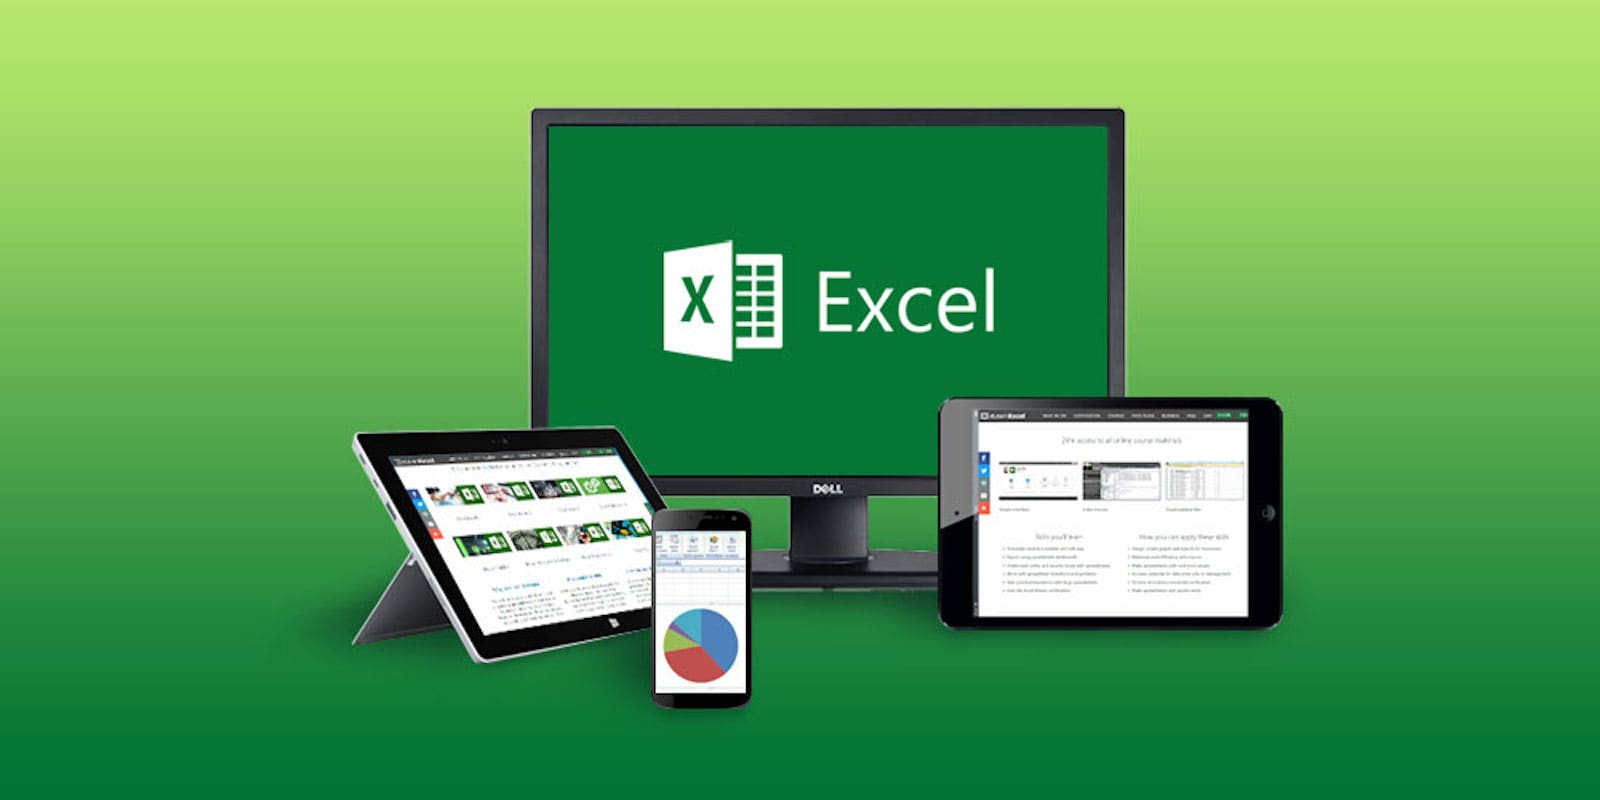 CoM - eLearnExcel Microsoft Excel School- Lifetime Subscription